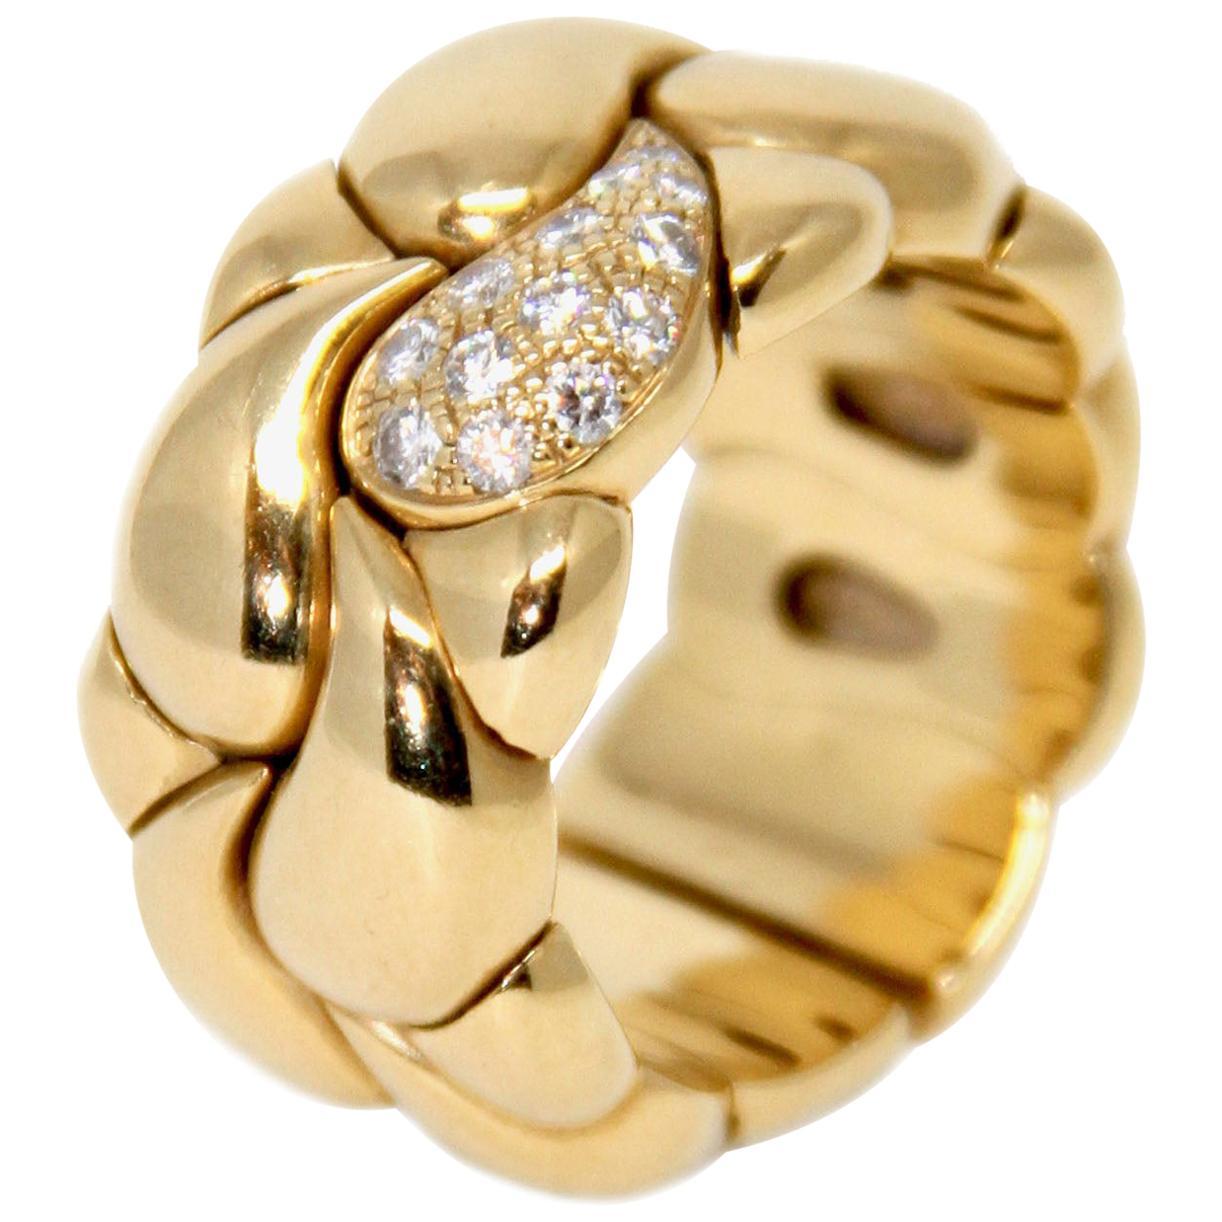 Chopard Casmir 18 Karat Yellow Gold and Diamond Ring